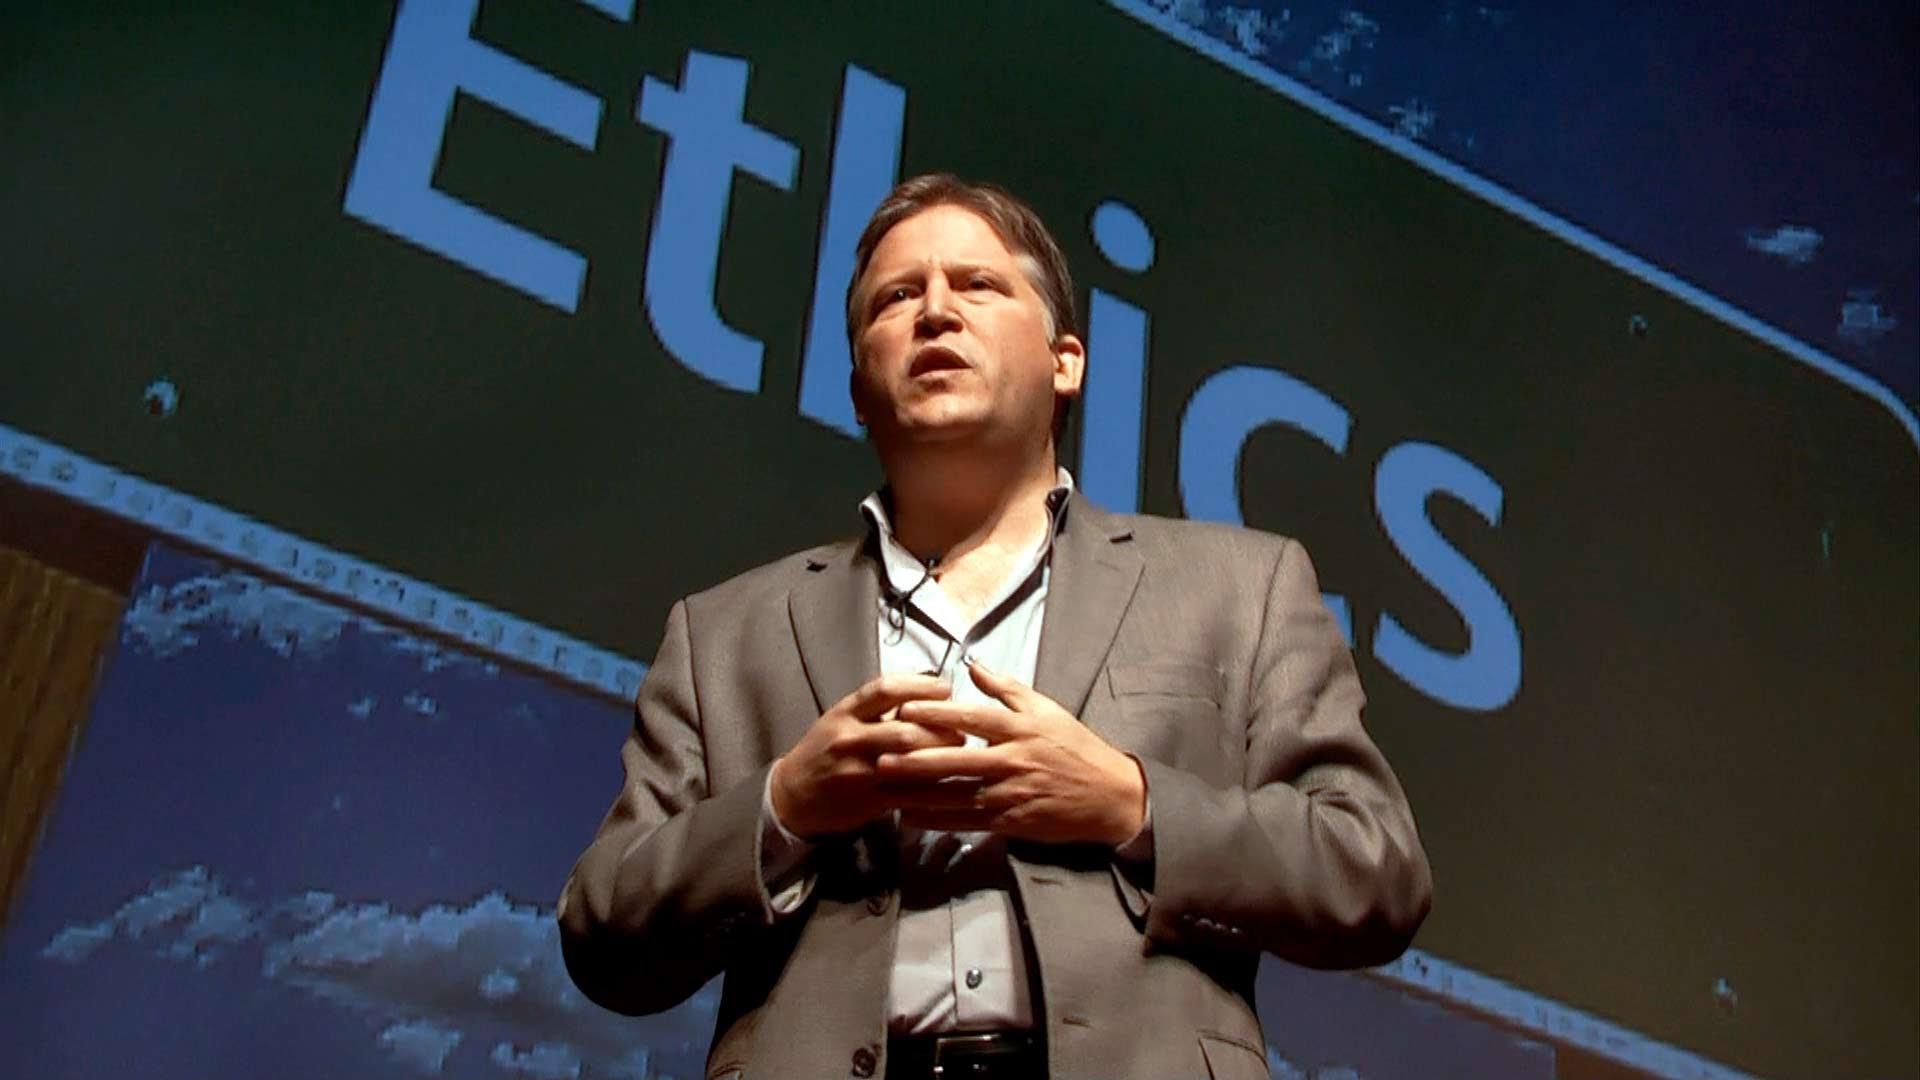 「Paul Root Wolpe:發光小狗、長人耳的老鼠...失控的生物工程學」- It's Time to Question Bio-Engineering